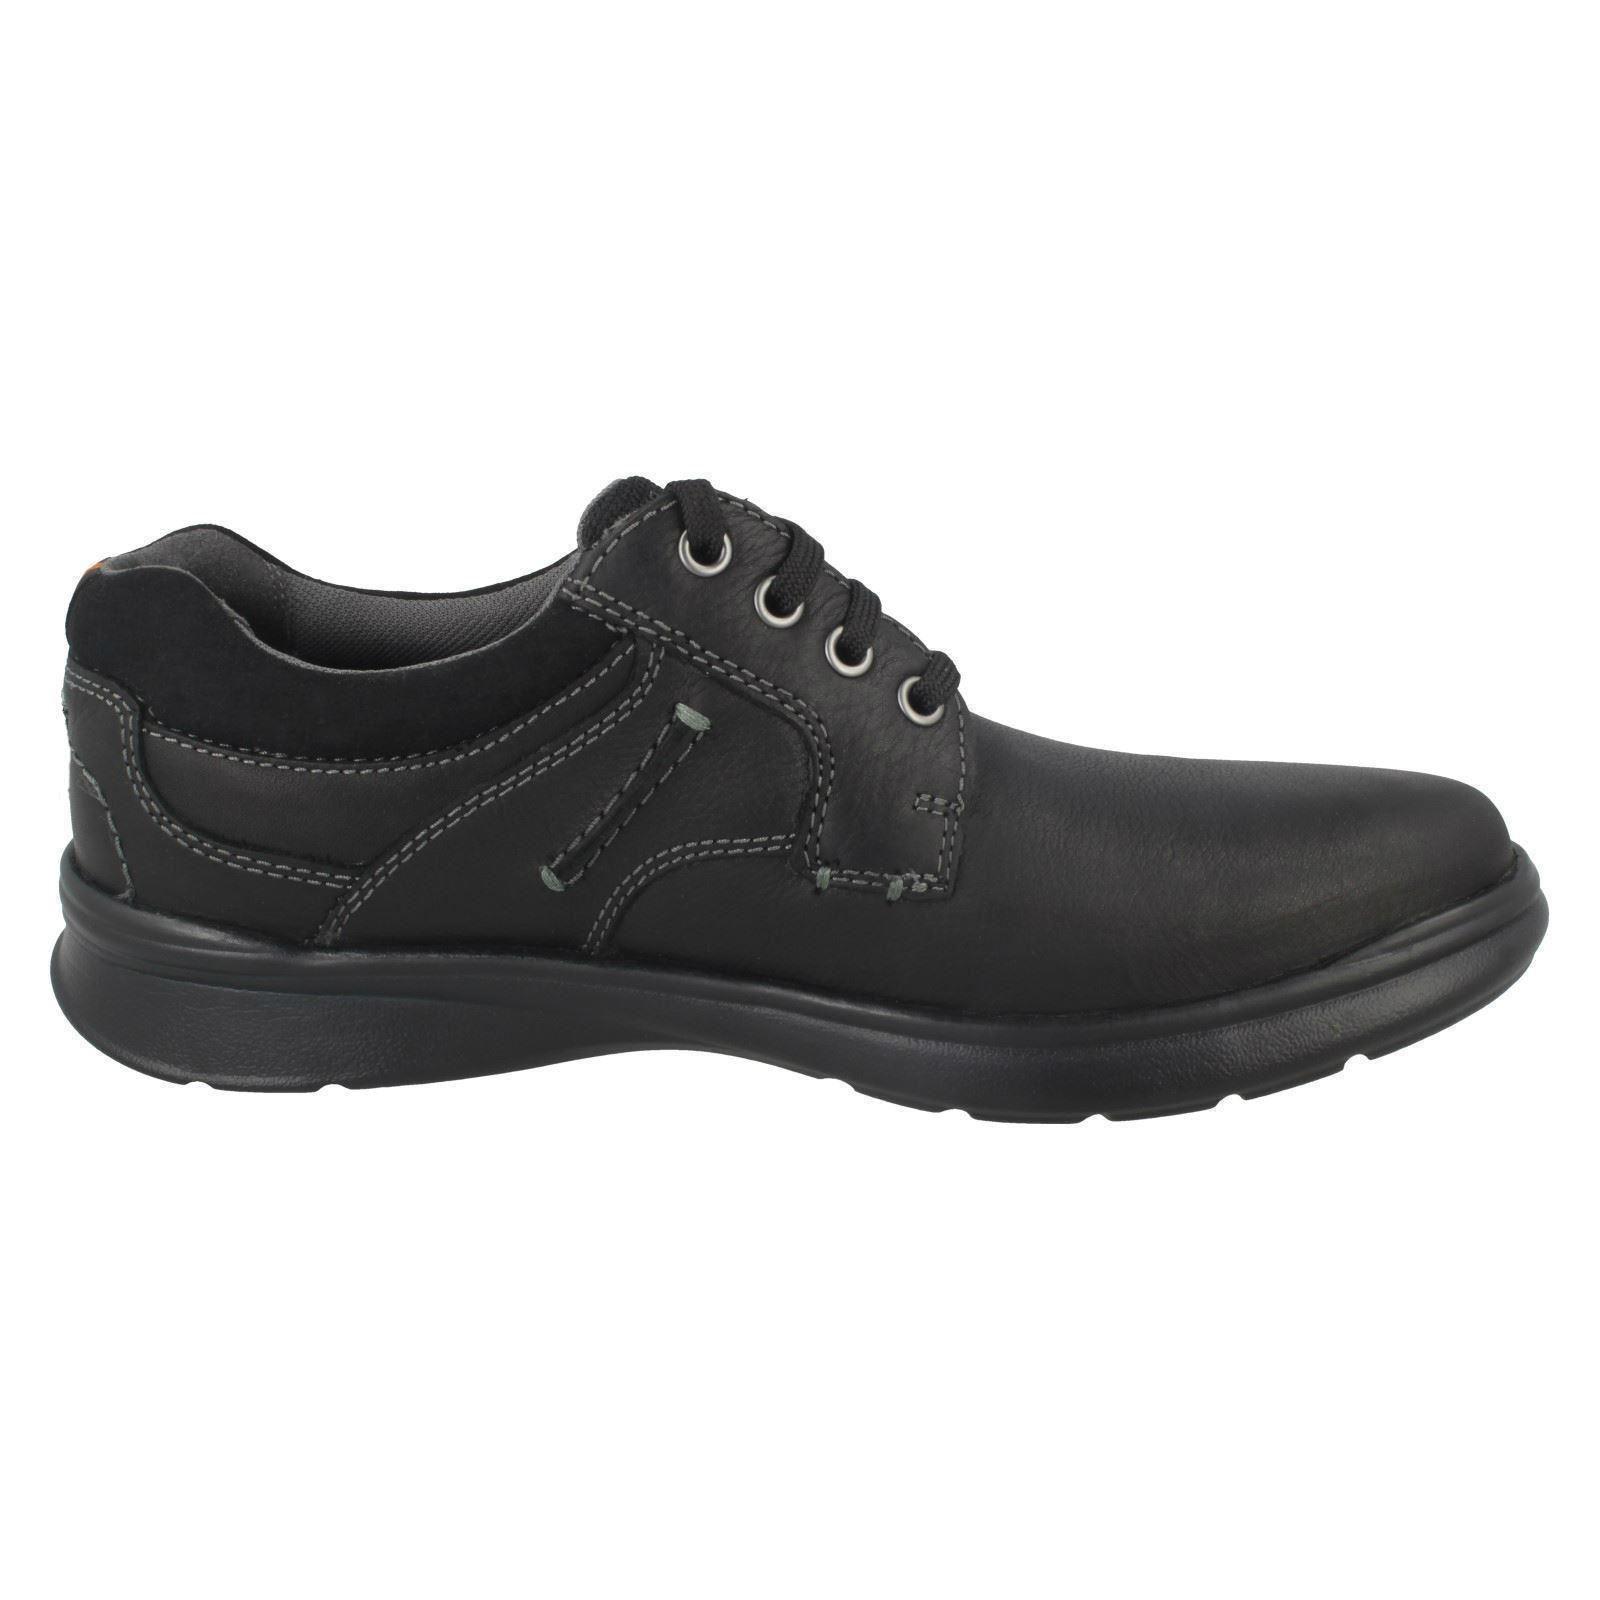 Herren Clarks 'Cotrell Plain' Plain' Plain' Smart Schuhes c81284